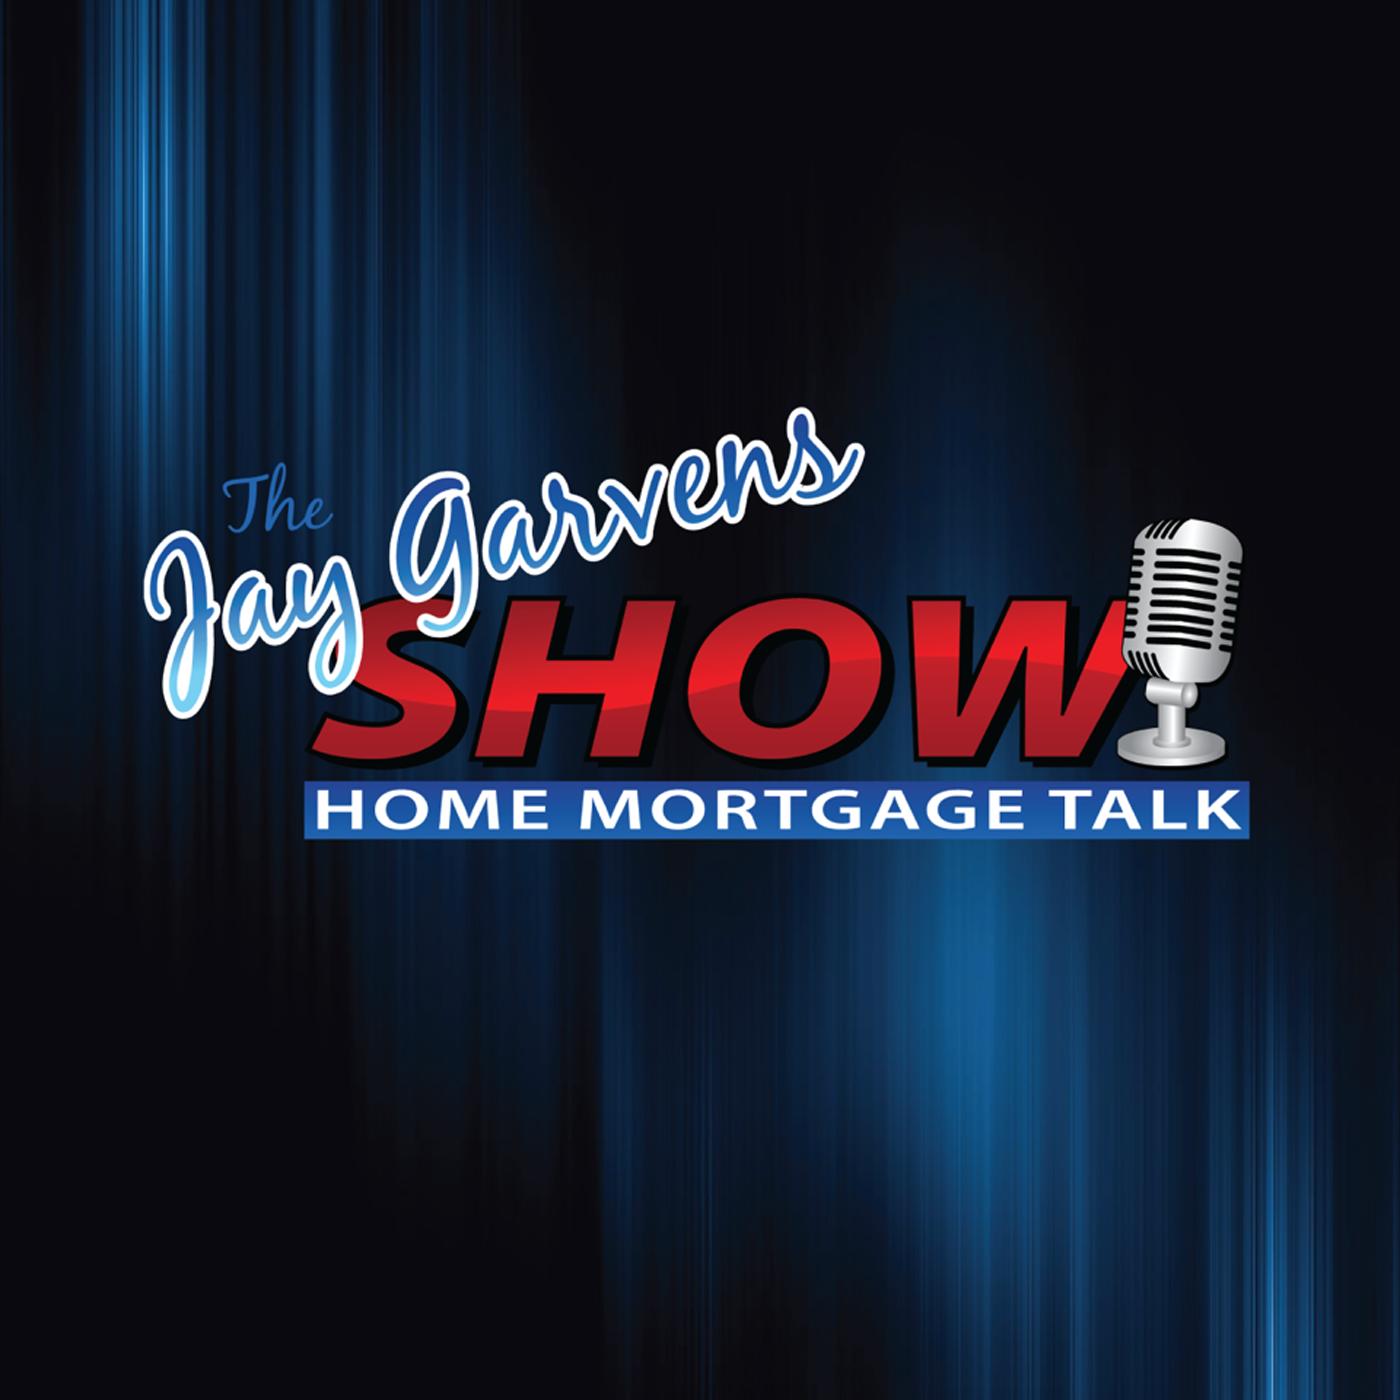 The Jay Garvens Show